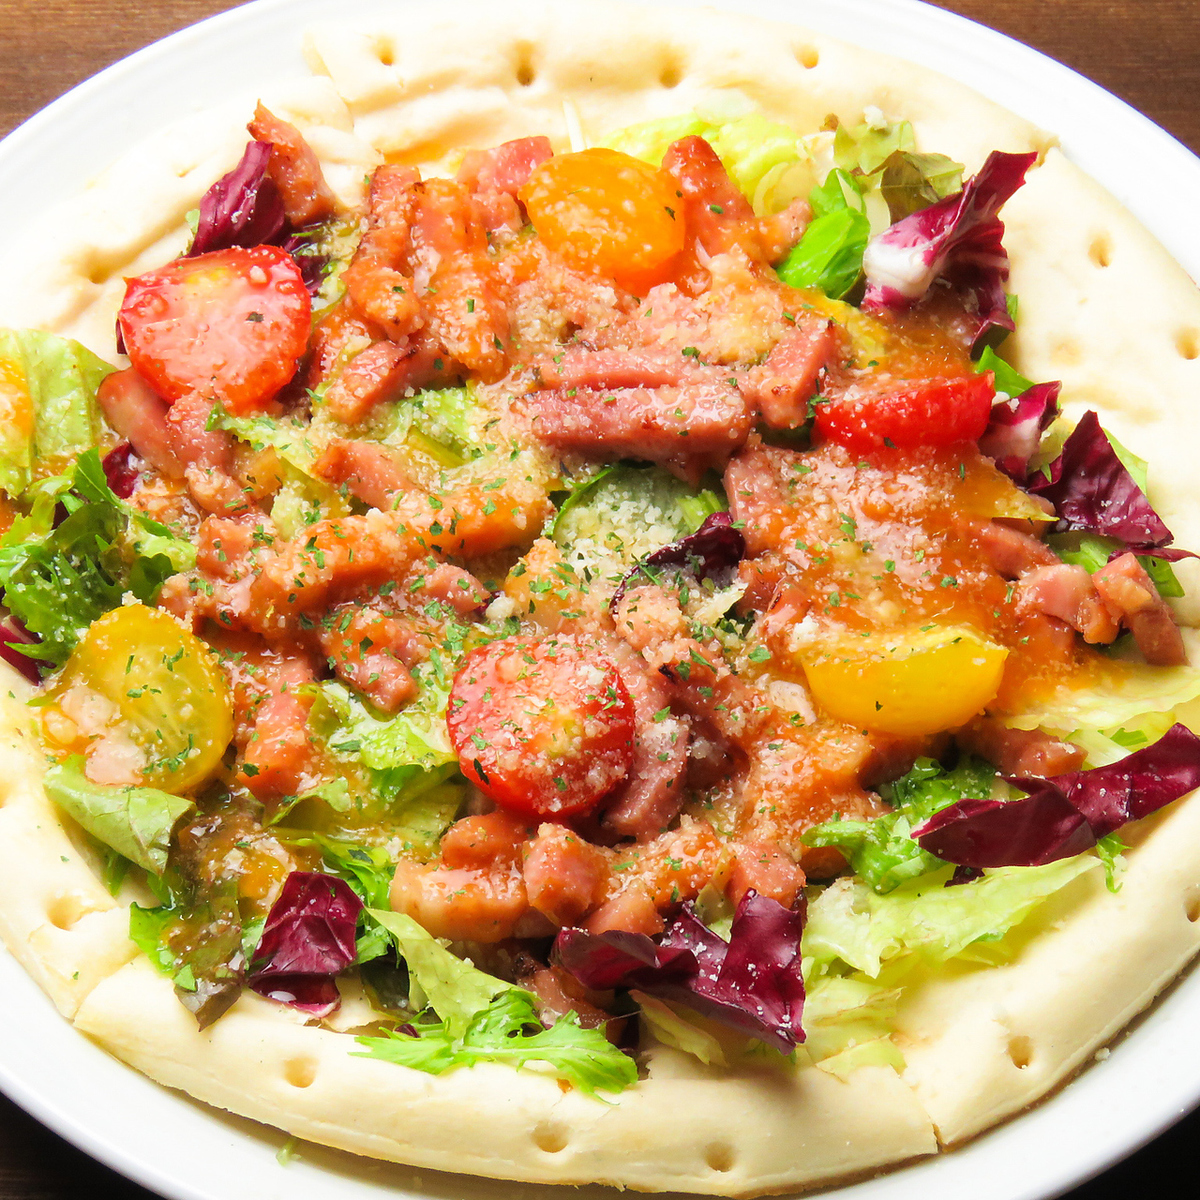 Bruketta pizza ☆ banquet course is also good ◎